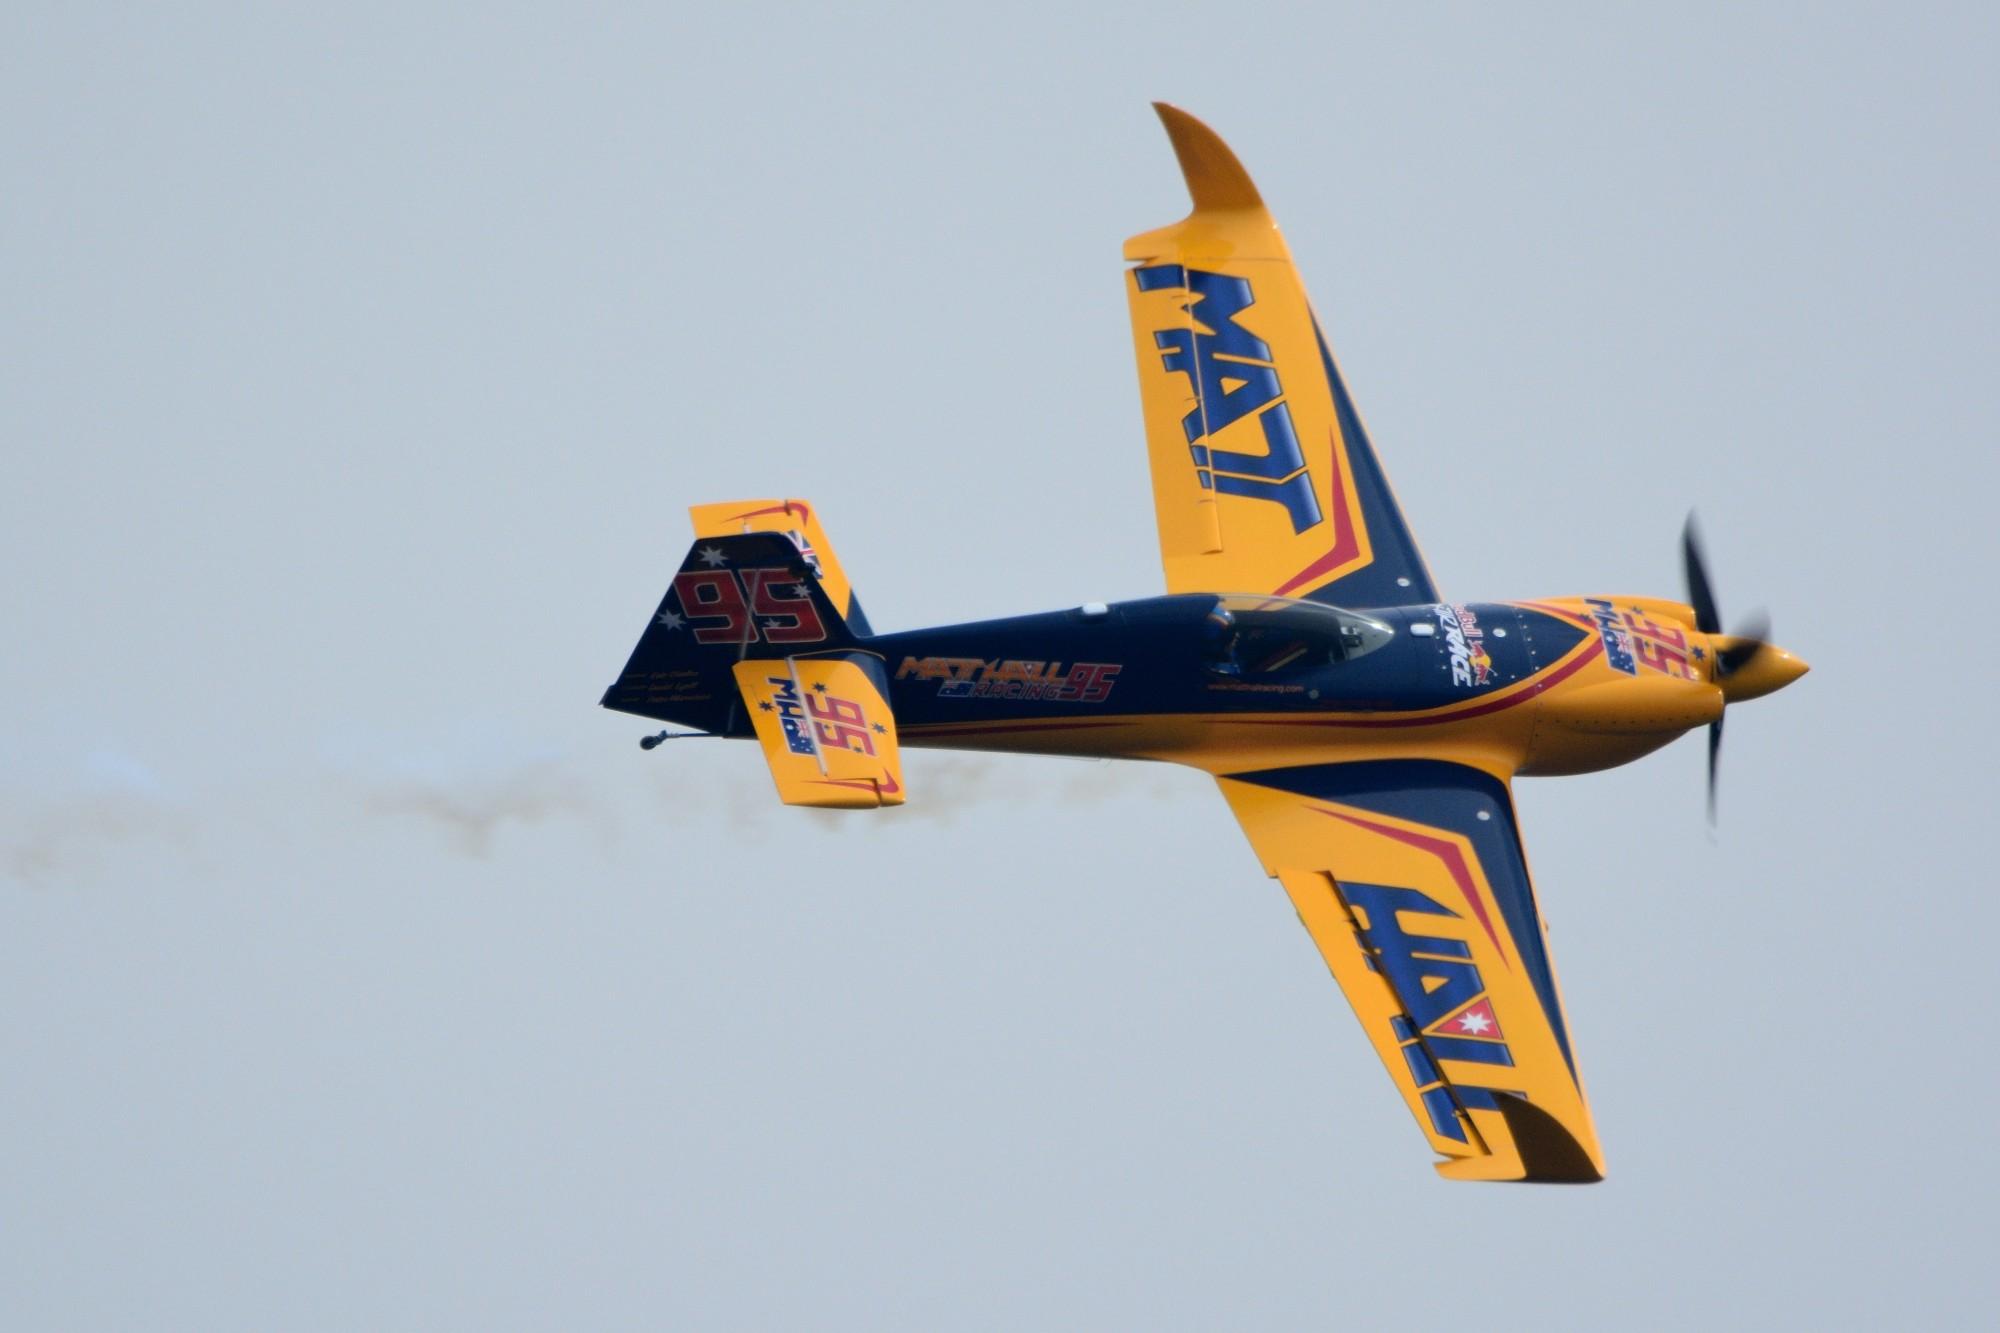 Red_Bull_Air_Race_Chiba_MXS-R_Matt_Hall